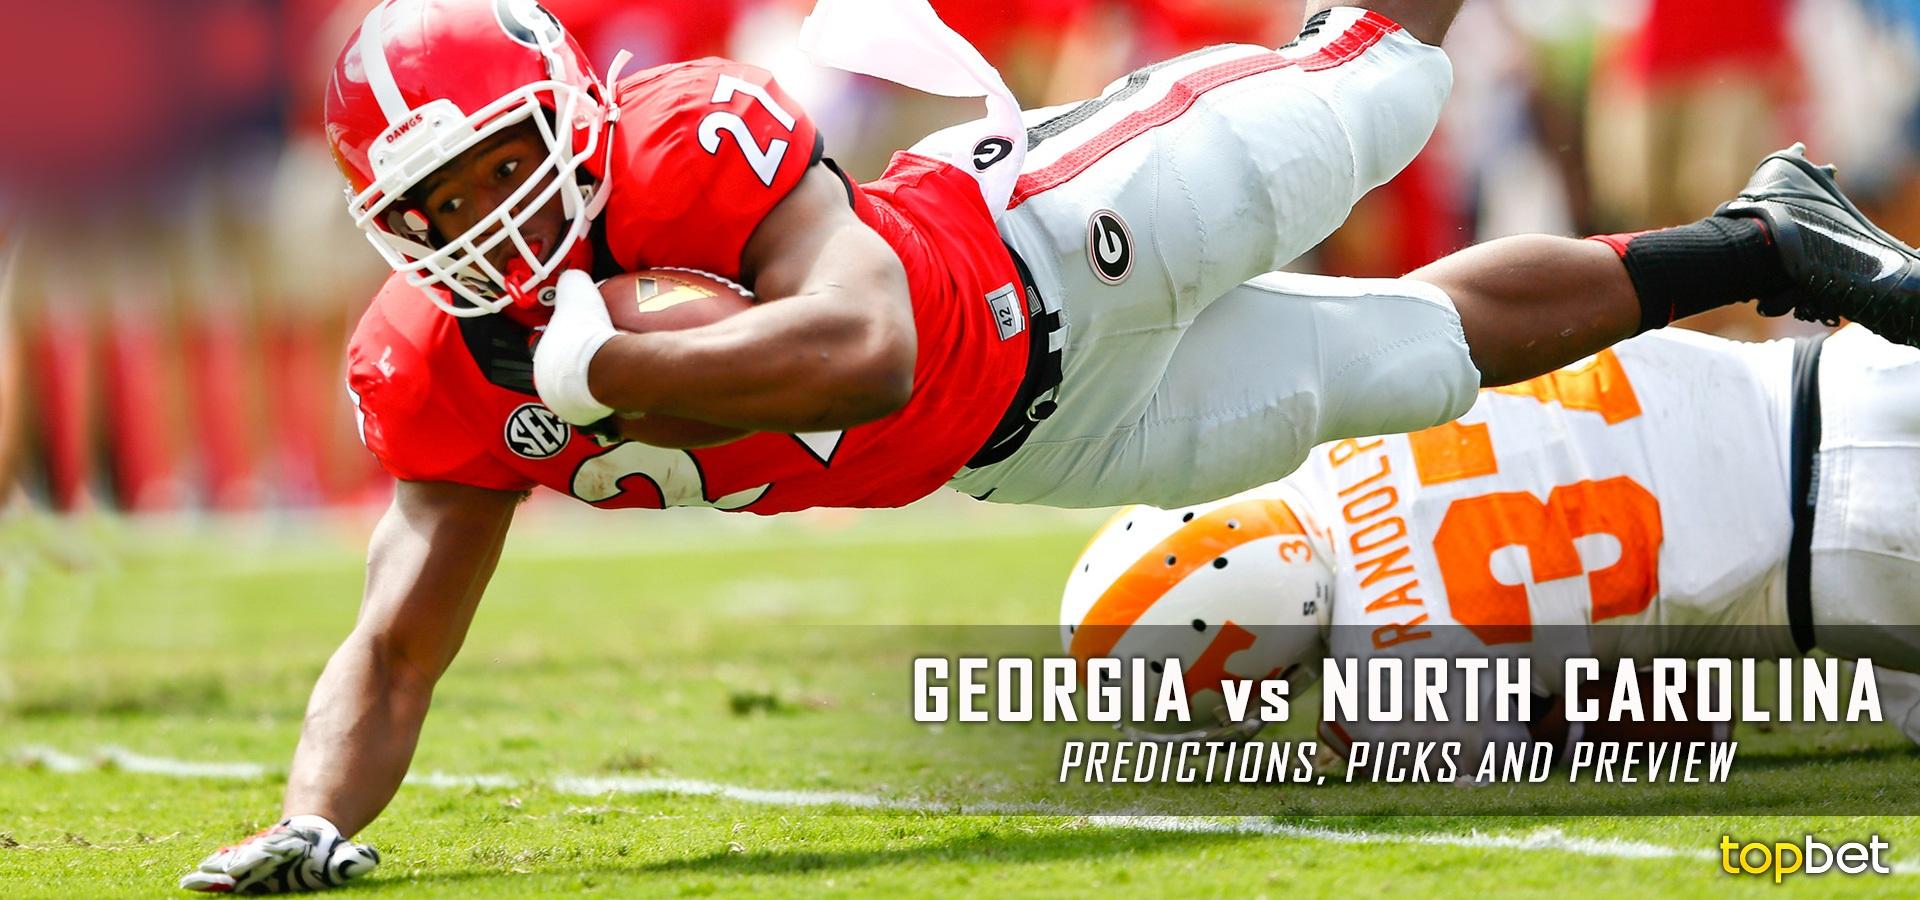 Georgia Vs North Carolina Football Predictions, Picks & Odds